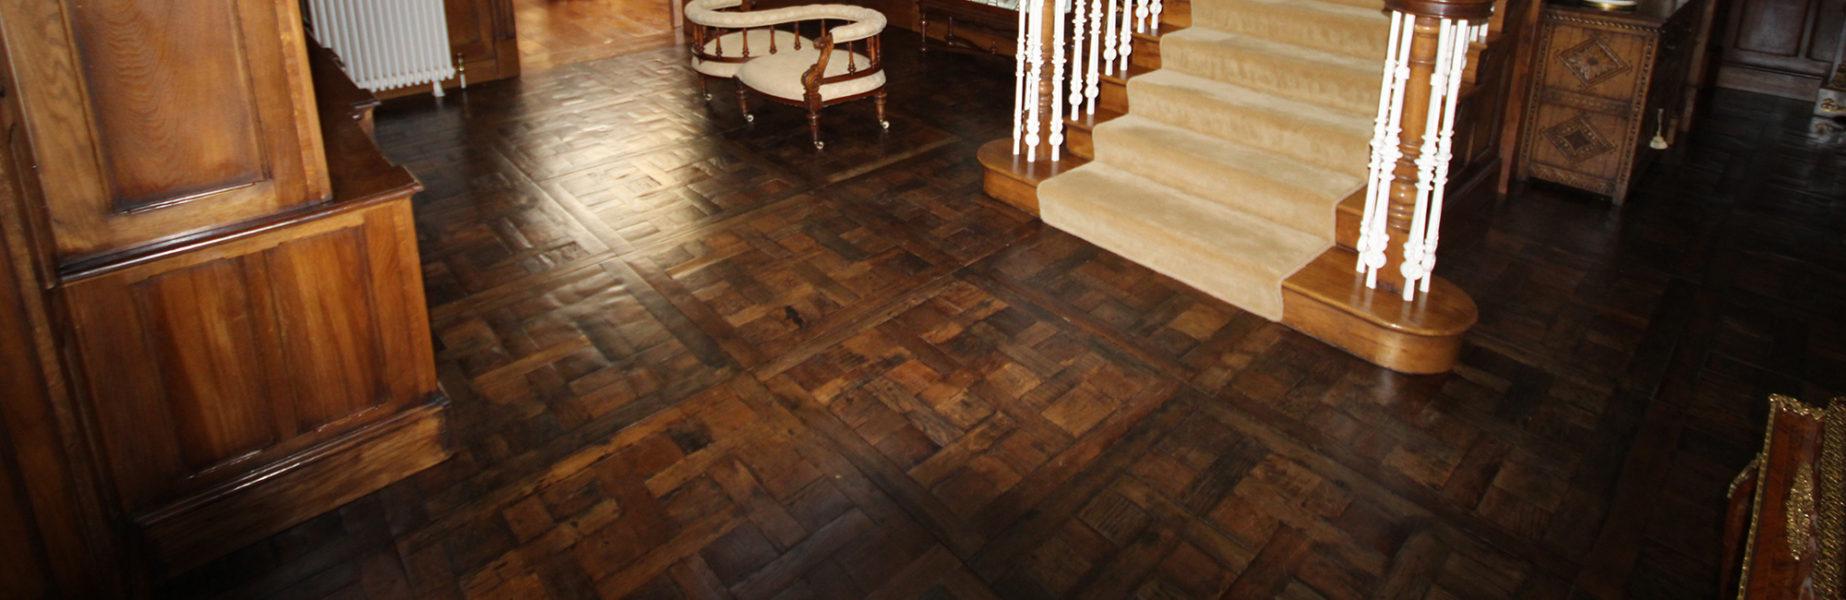 Dyfed Richards Wood Flooring Specialists